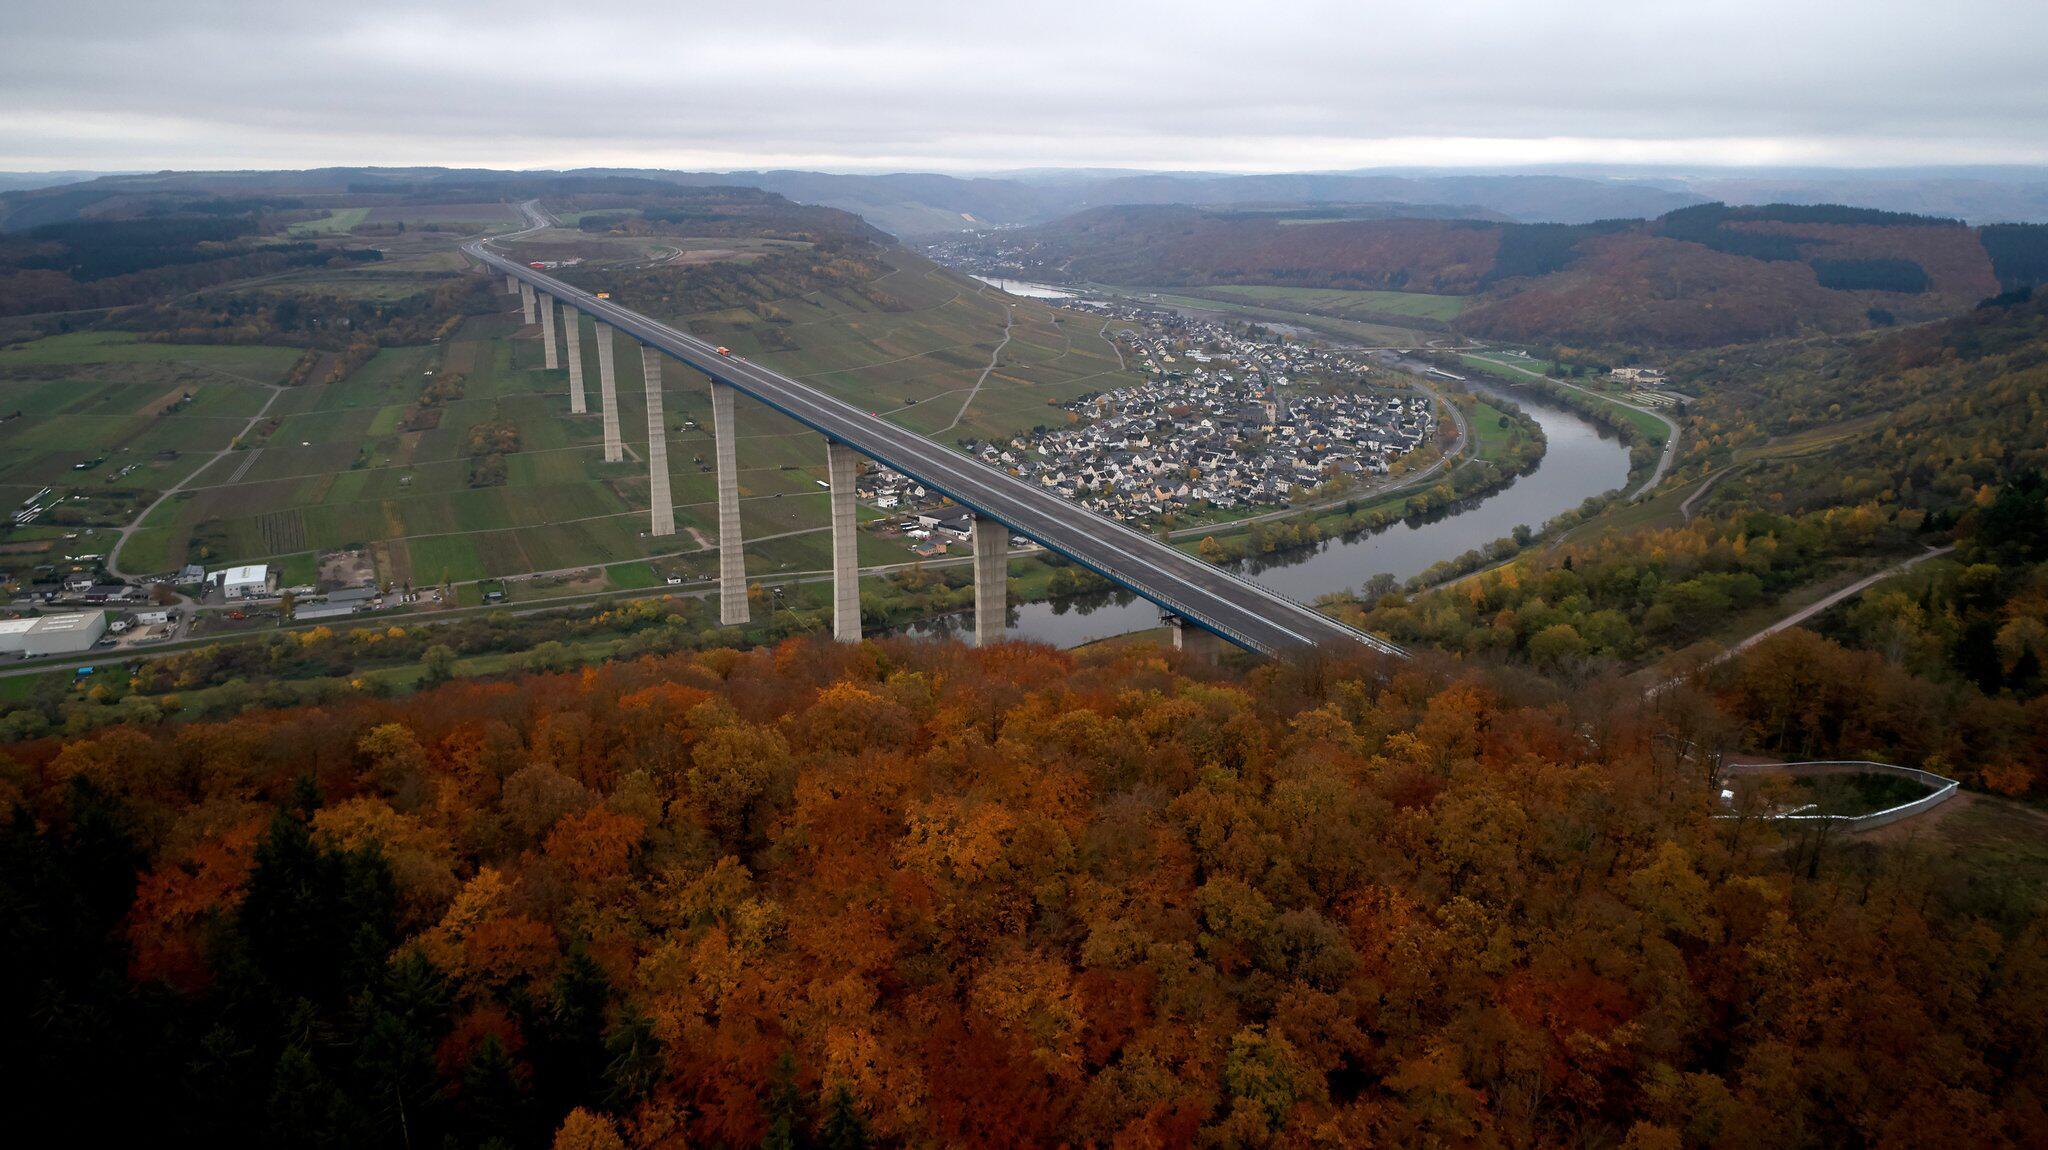 Bild zu Hochmoselbrücke, Hochmosel, Zeltingen, Rachtig, Rheinland-Pfalz